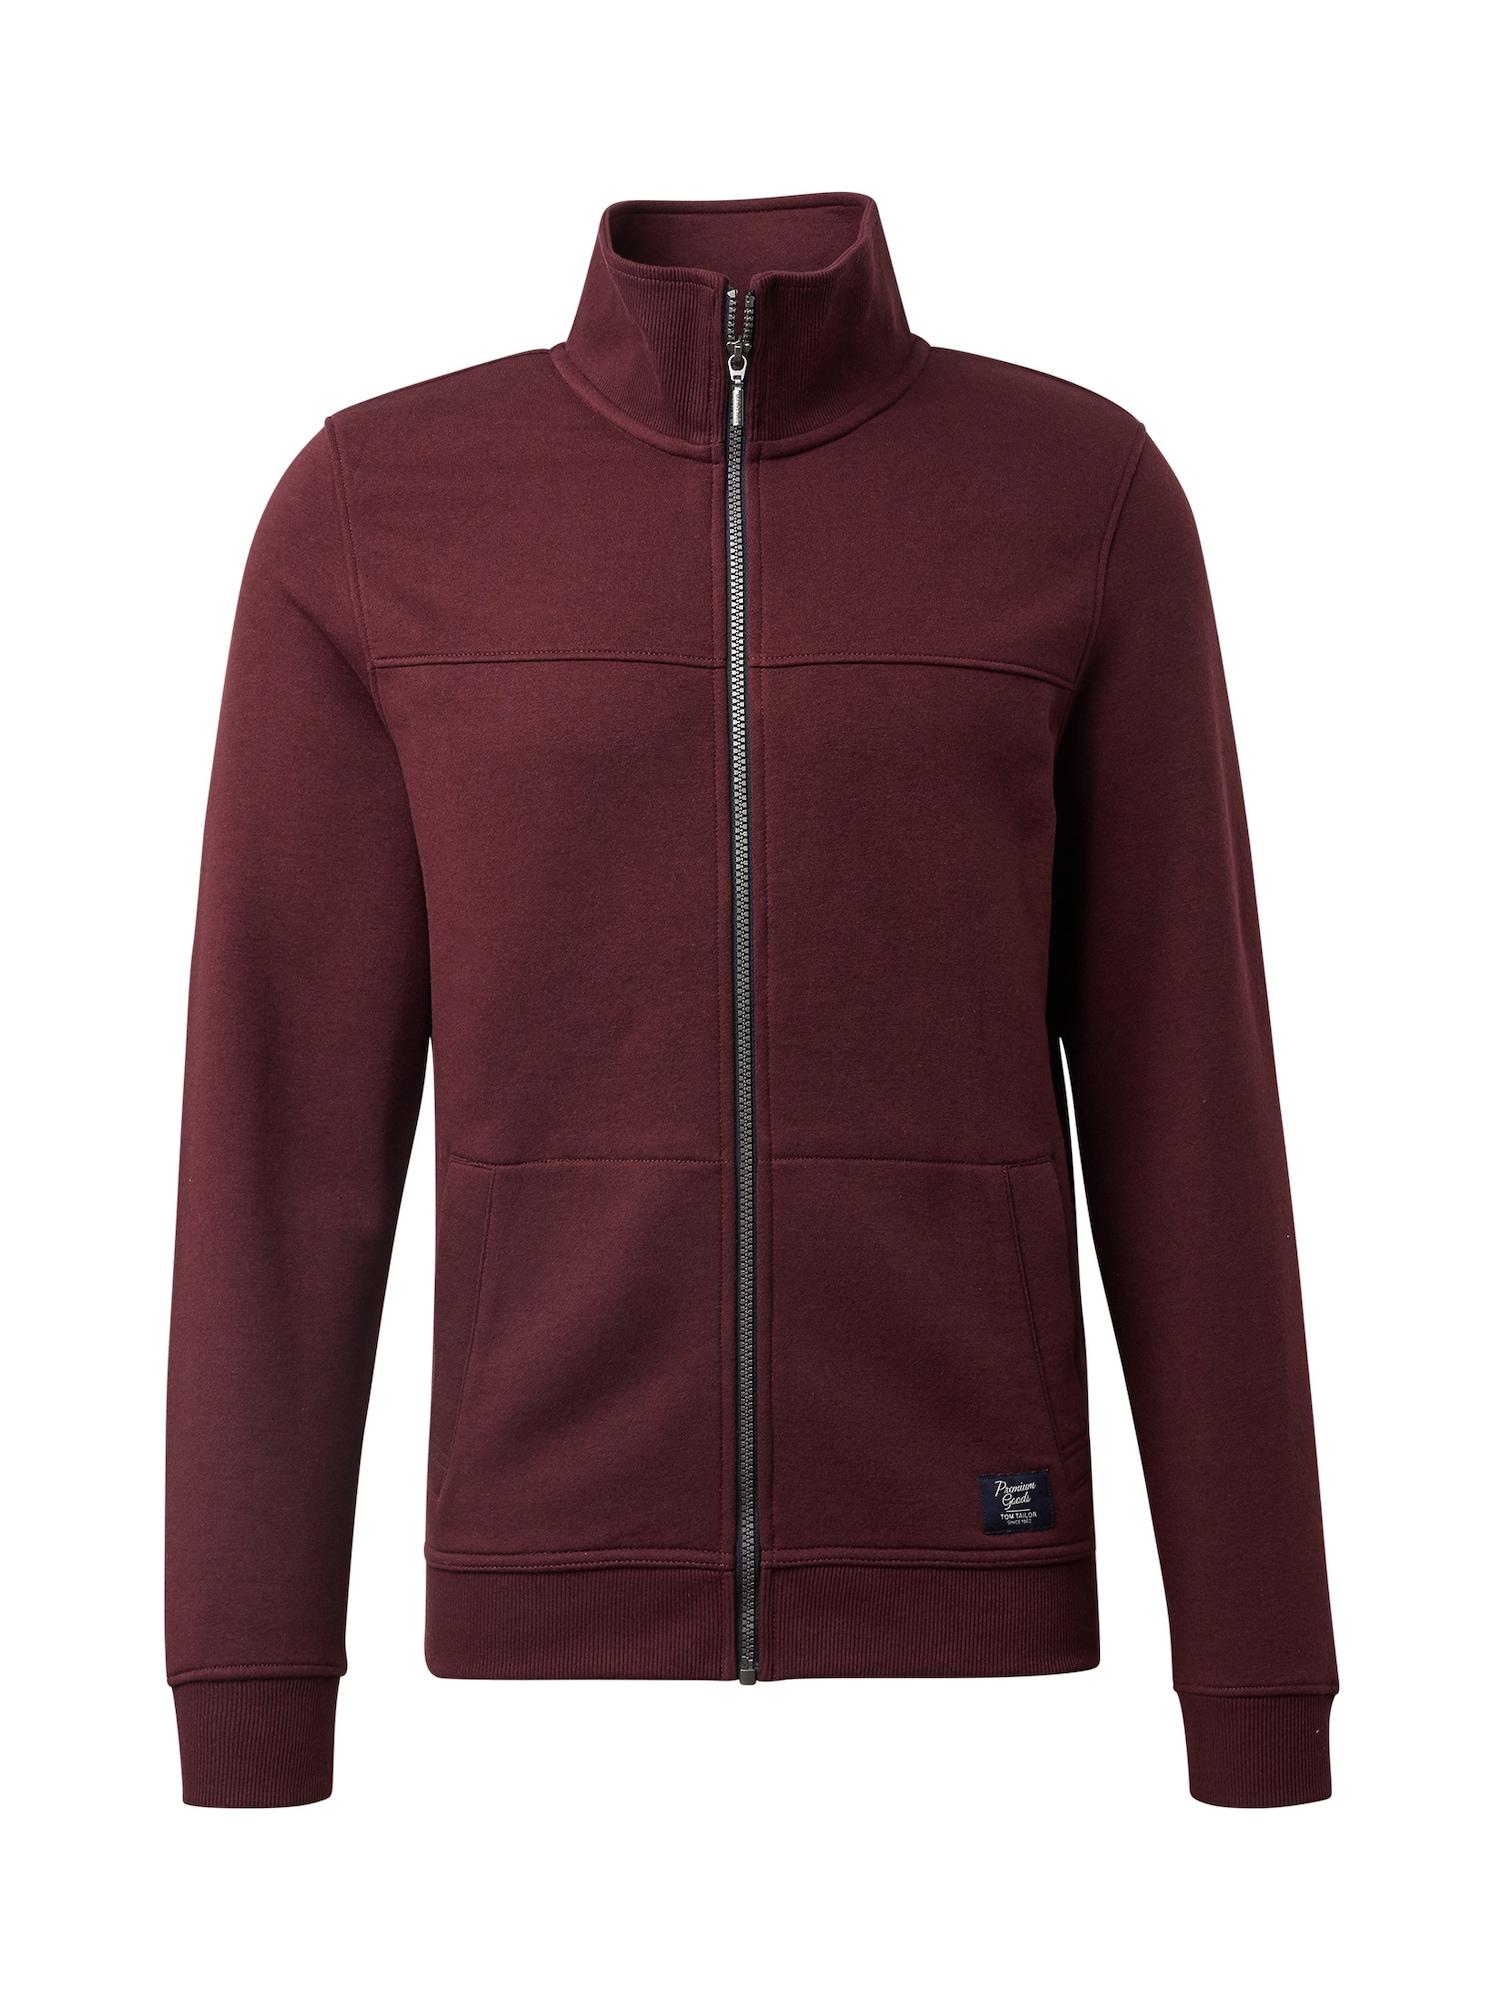 Sweatjacke | Bekleidung > Sweatshirts & -jacken | TOM TAILOR